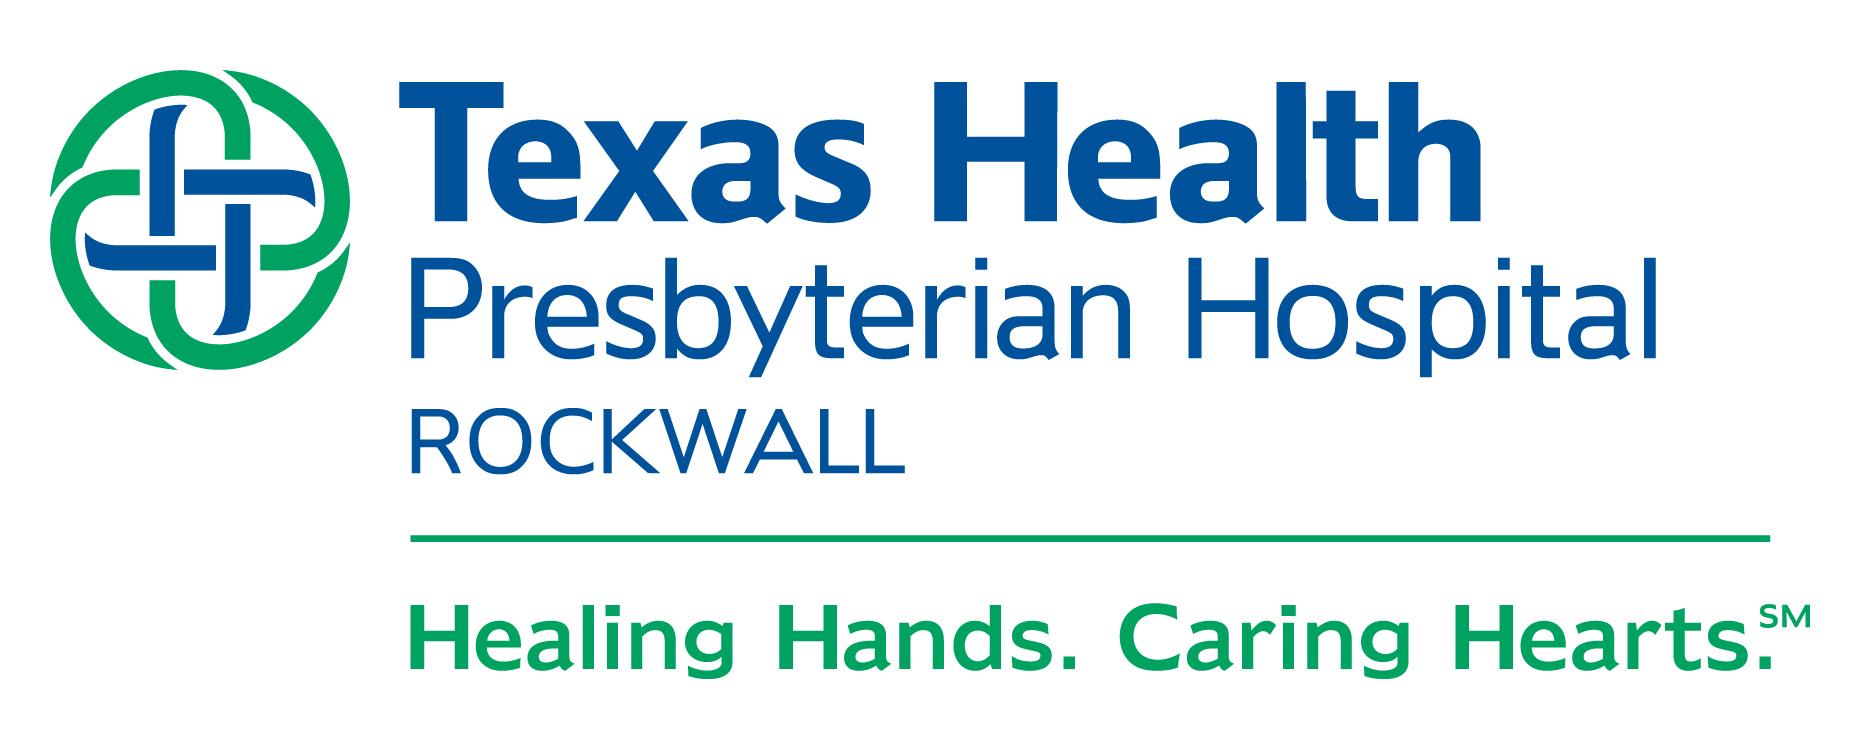 Texas Health Presbyterian Hospital Rockwall among 'Best Places to Work'